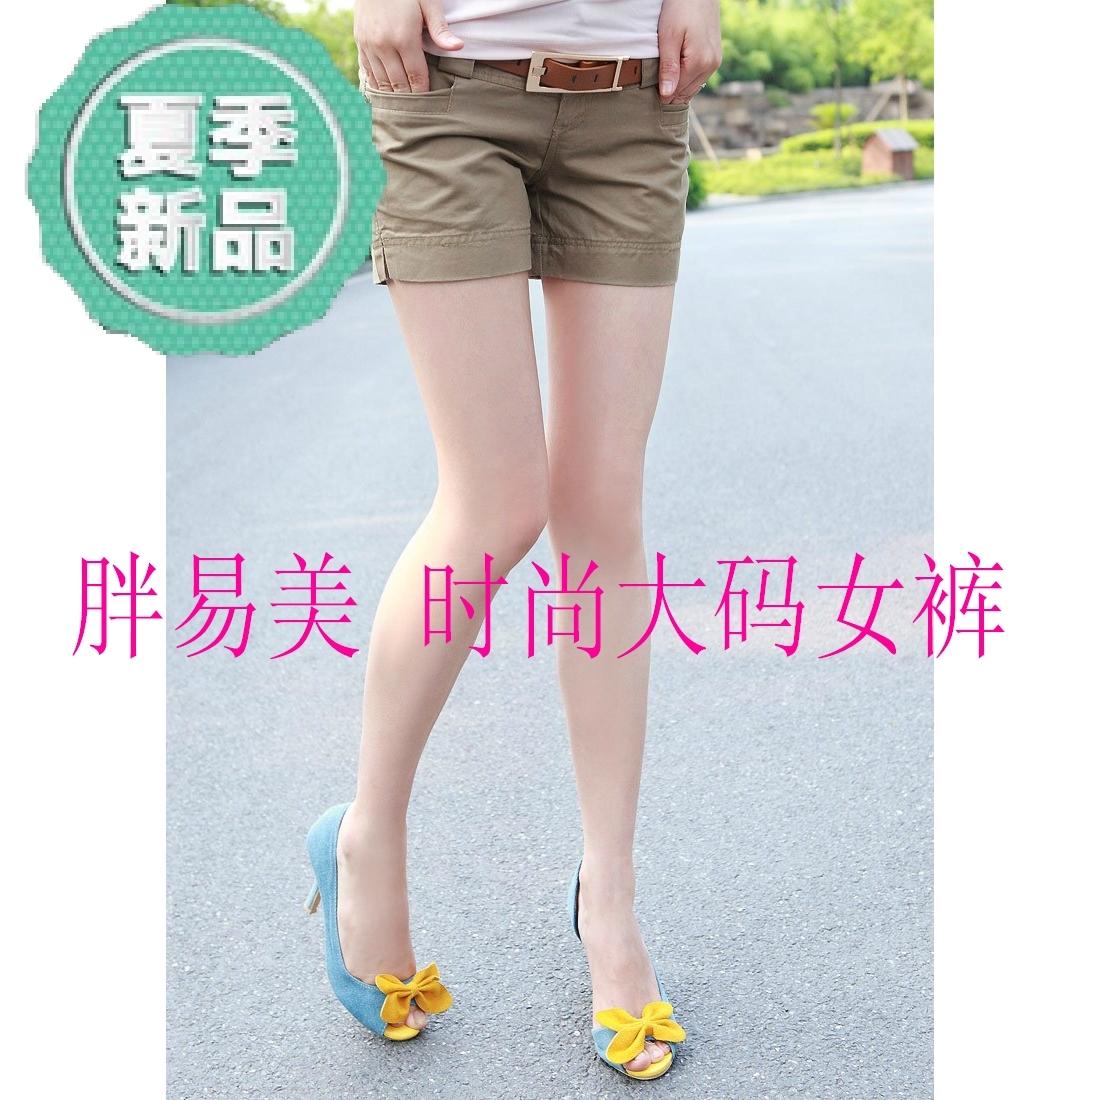 Женские брюки Fat Yi America 1138 2013 Шорты, мини-шорты Другая форма брюк 2013 года